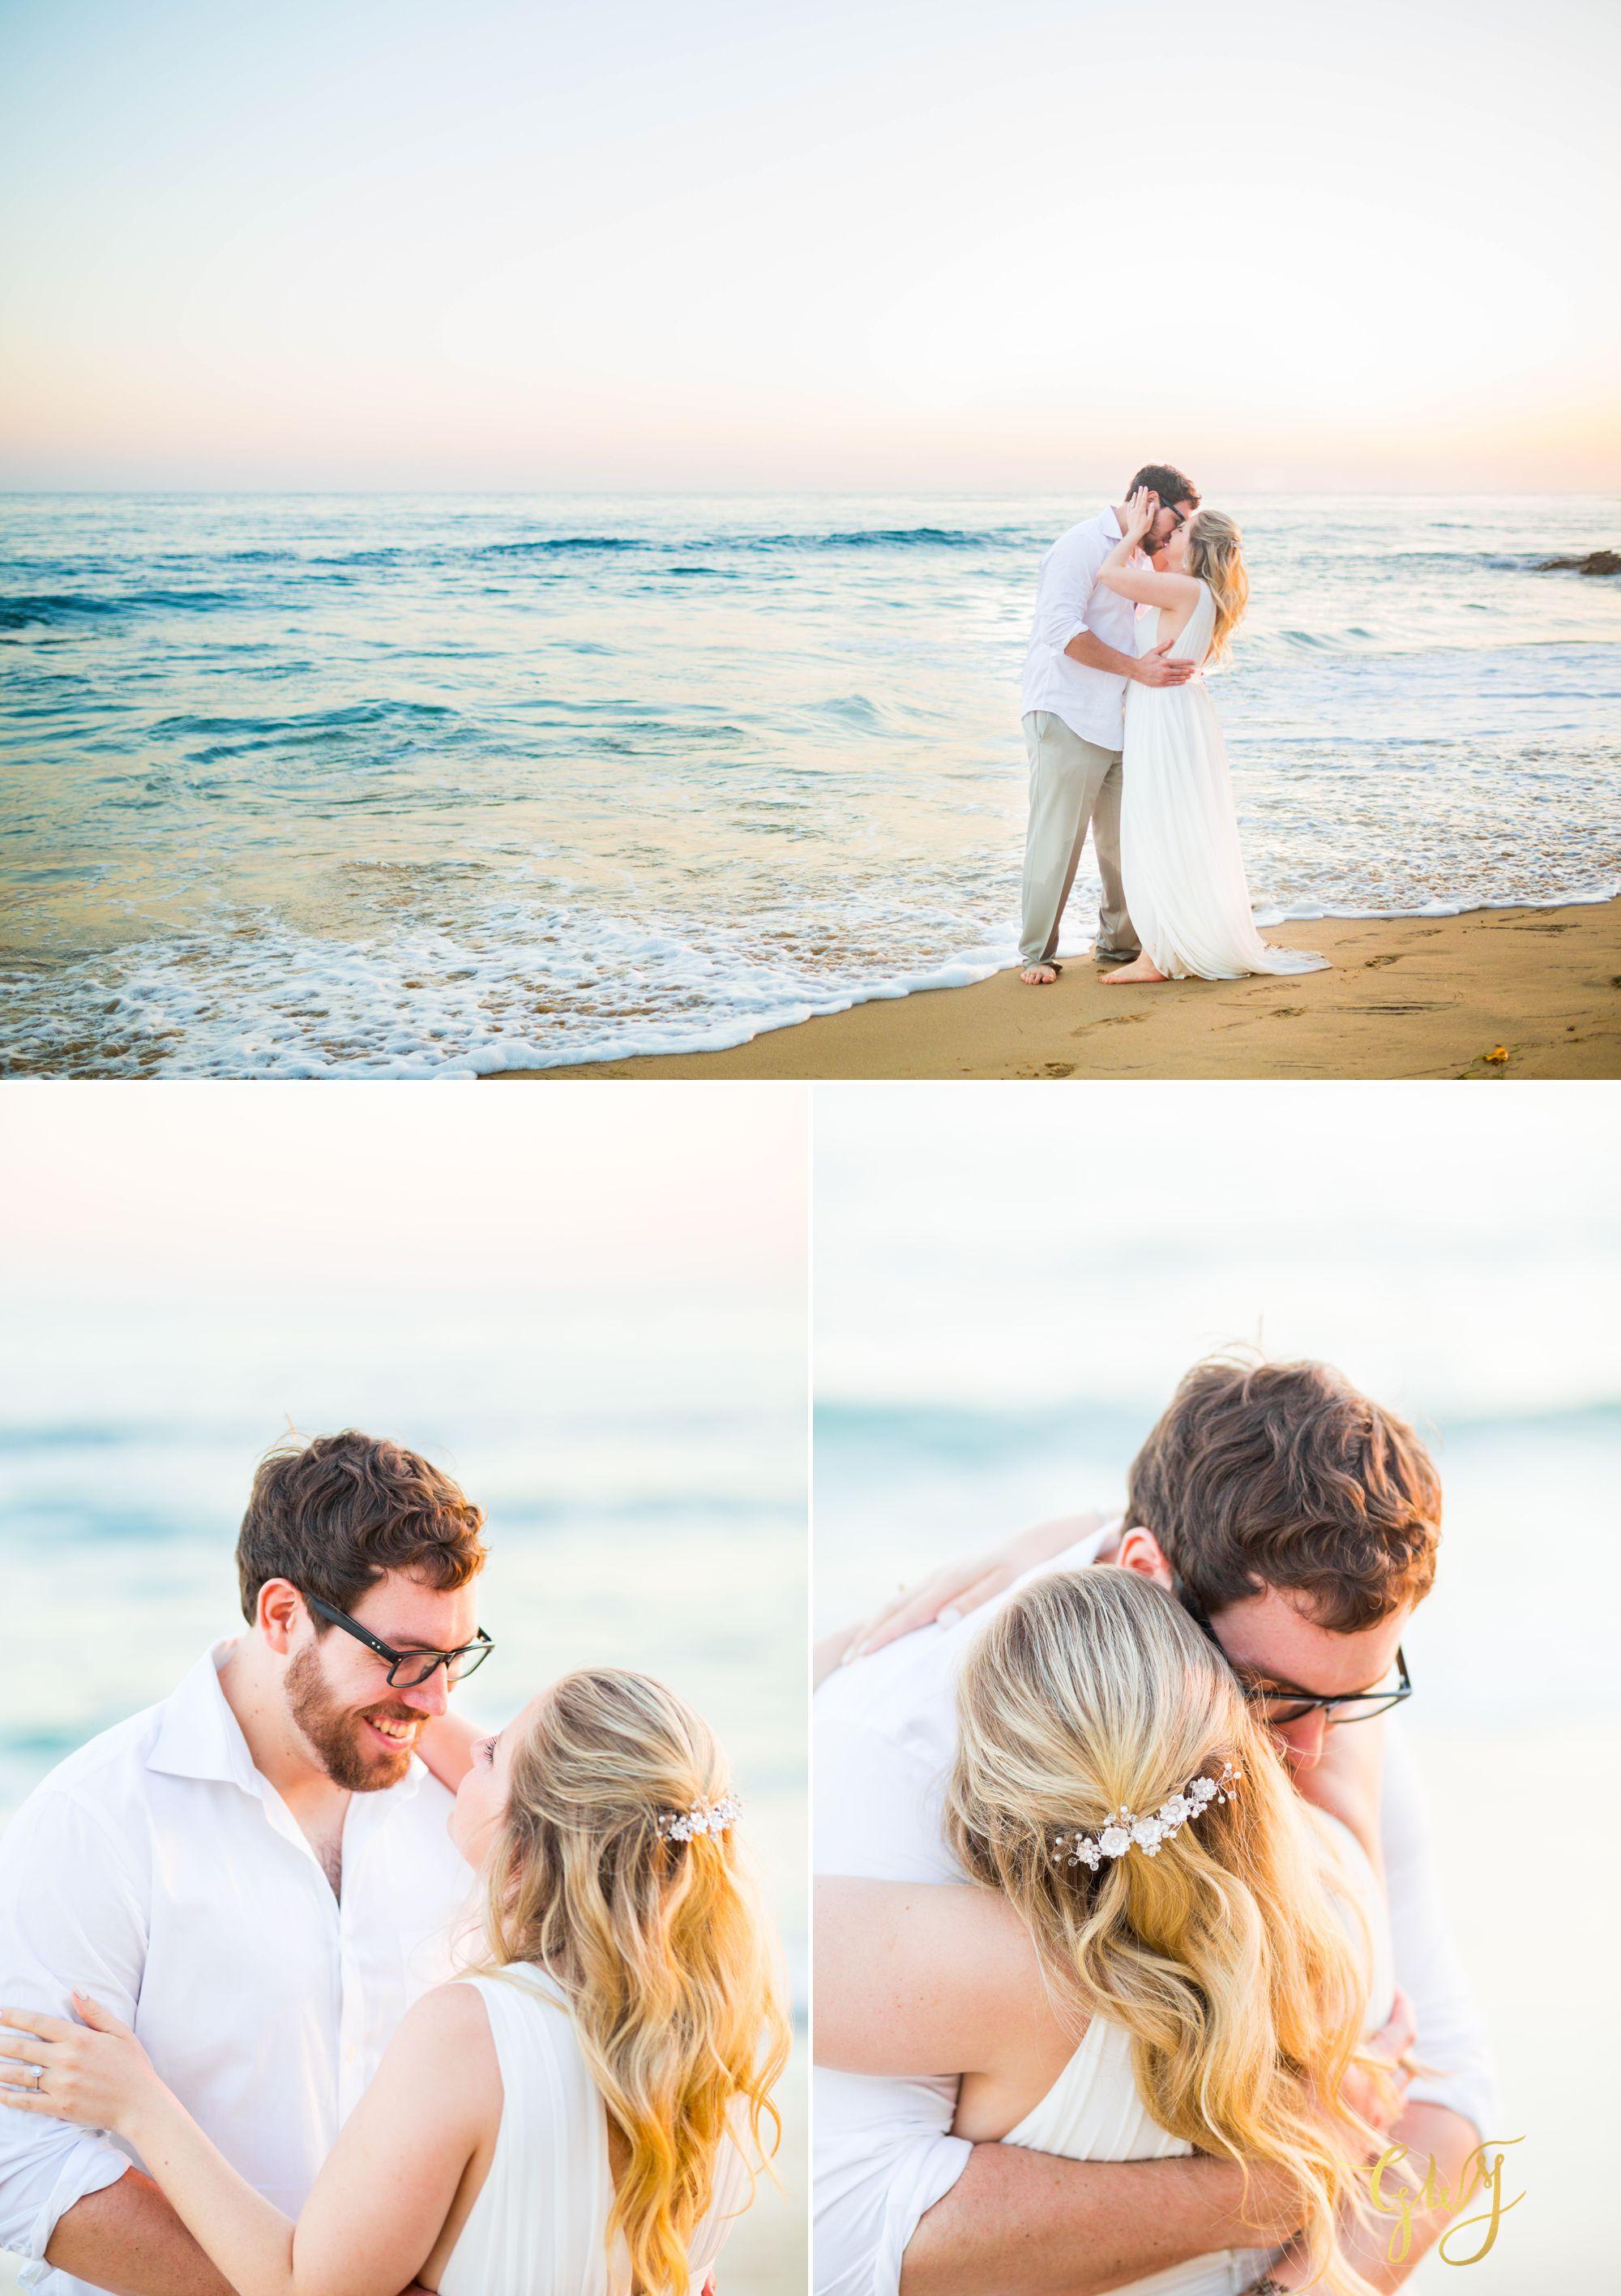 Amanda + Joe Reef Point Crystal Cove Newport Beach Sunset Romantic Intimate Elopement by Glass Woods Media 18.jpg